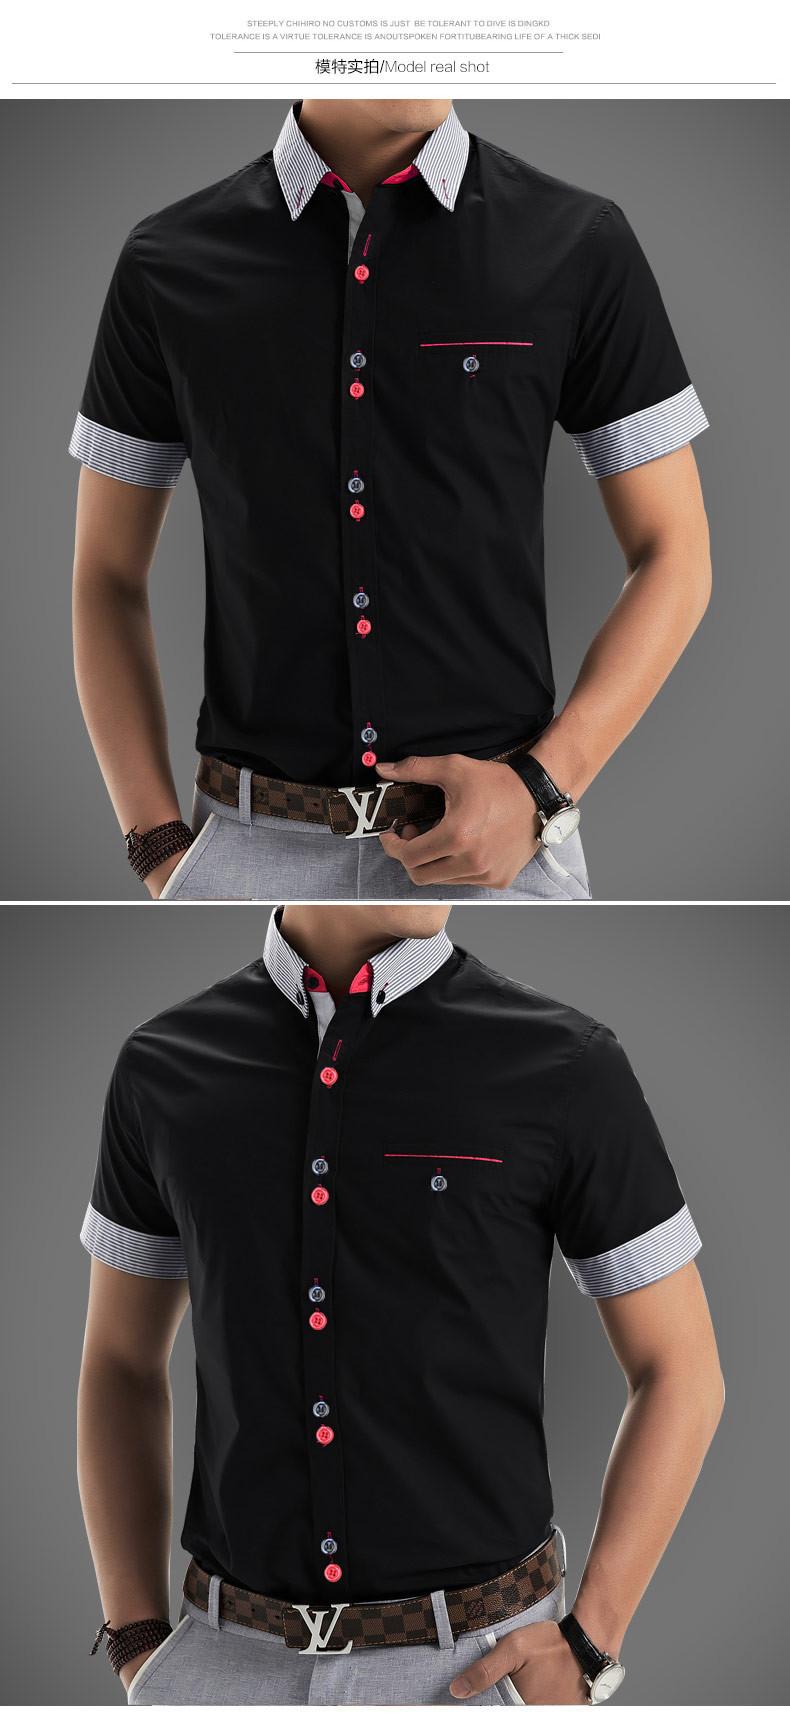 2015 Men Shirt New Brand Shirts Short Sleeve Casual Shirt Men Slim Fit Brand Design Formal Shirt Camisa Social Chemise Homme3